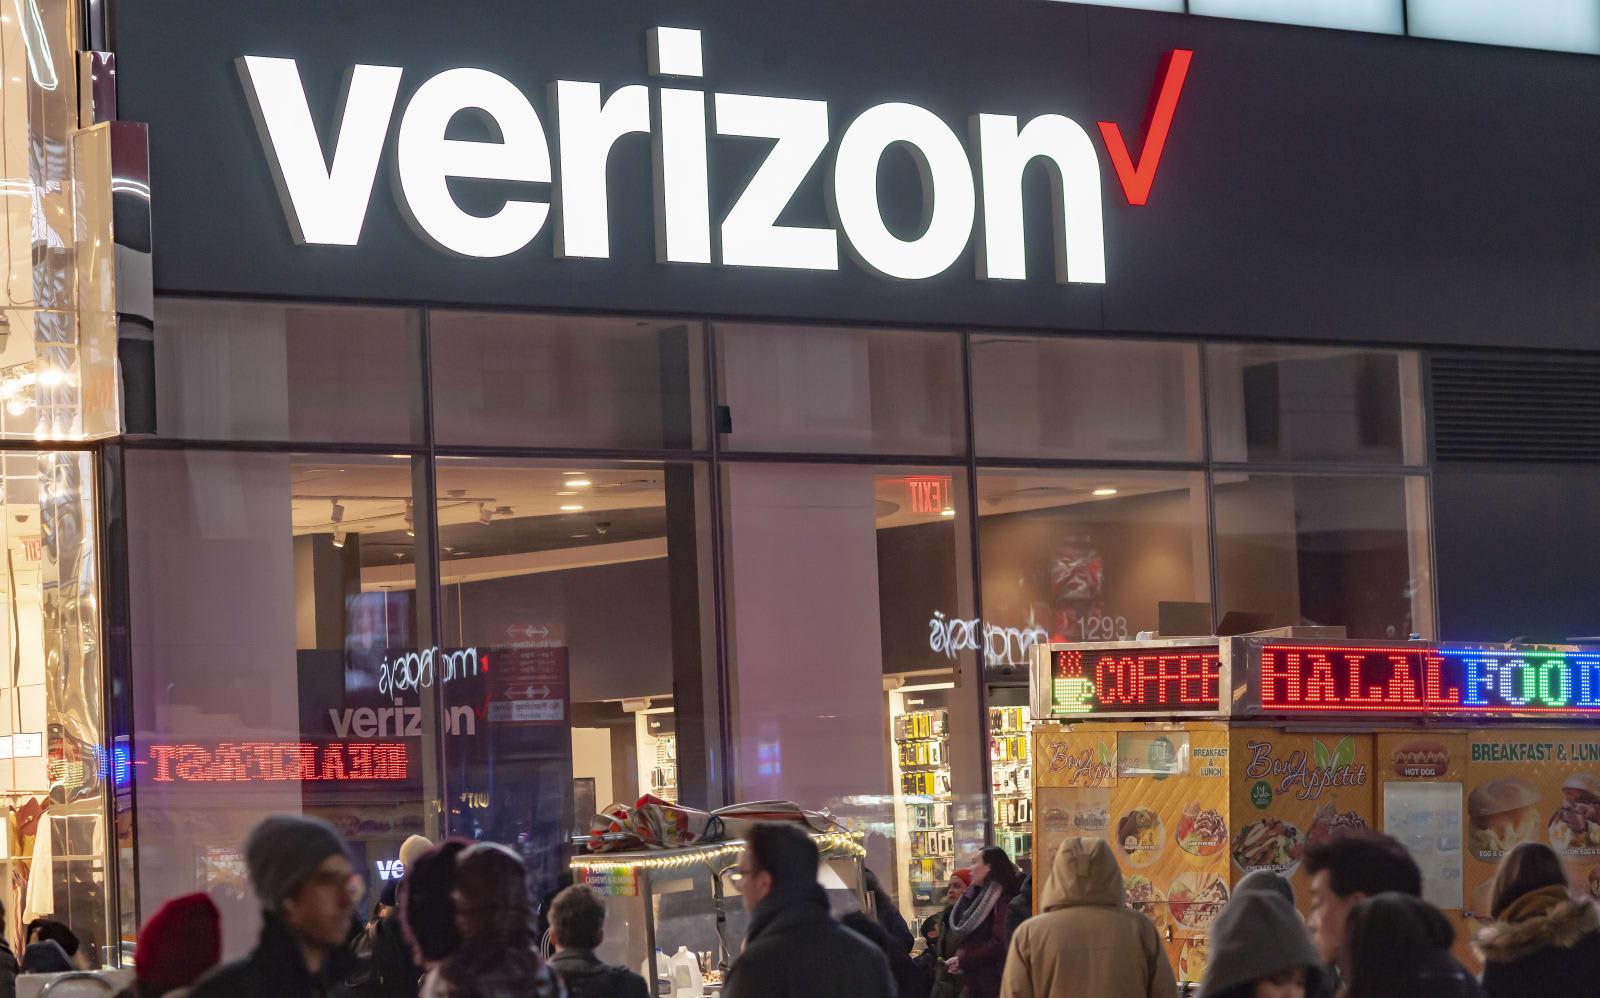 Verizon will offer YouTube TV to 5G and broadband customers